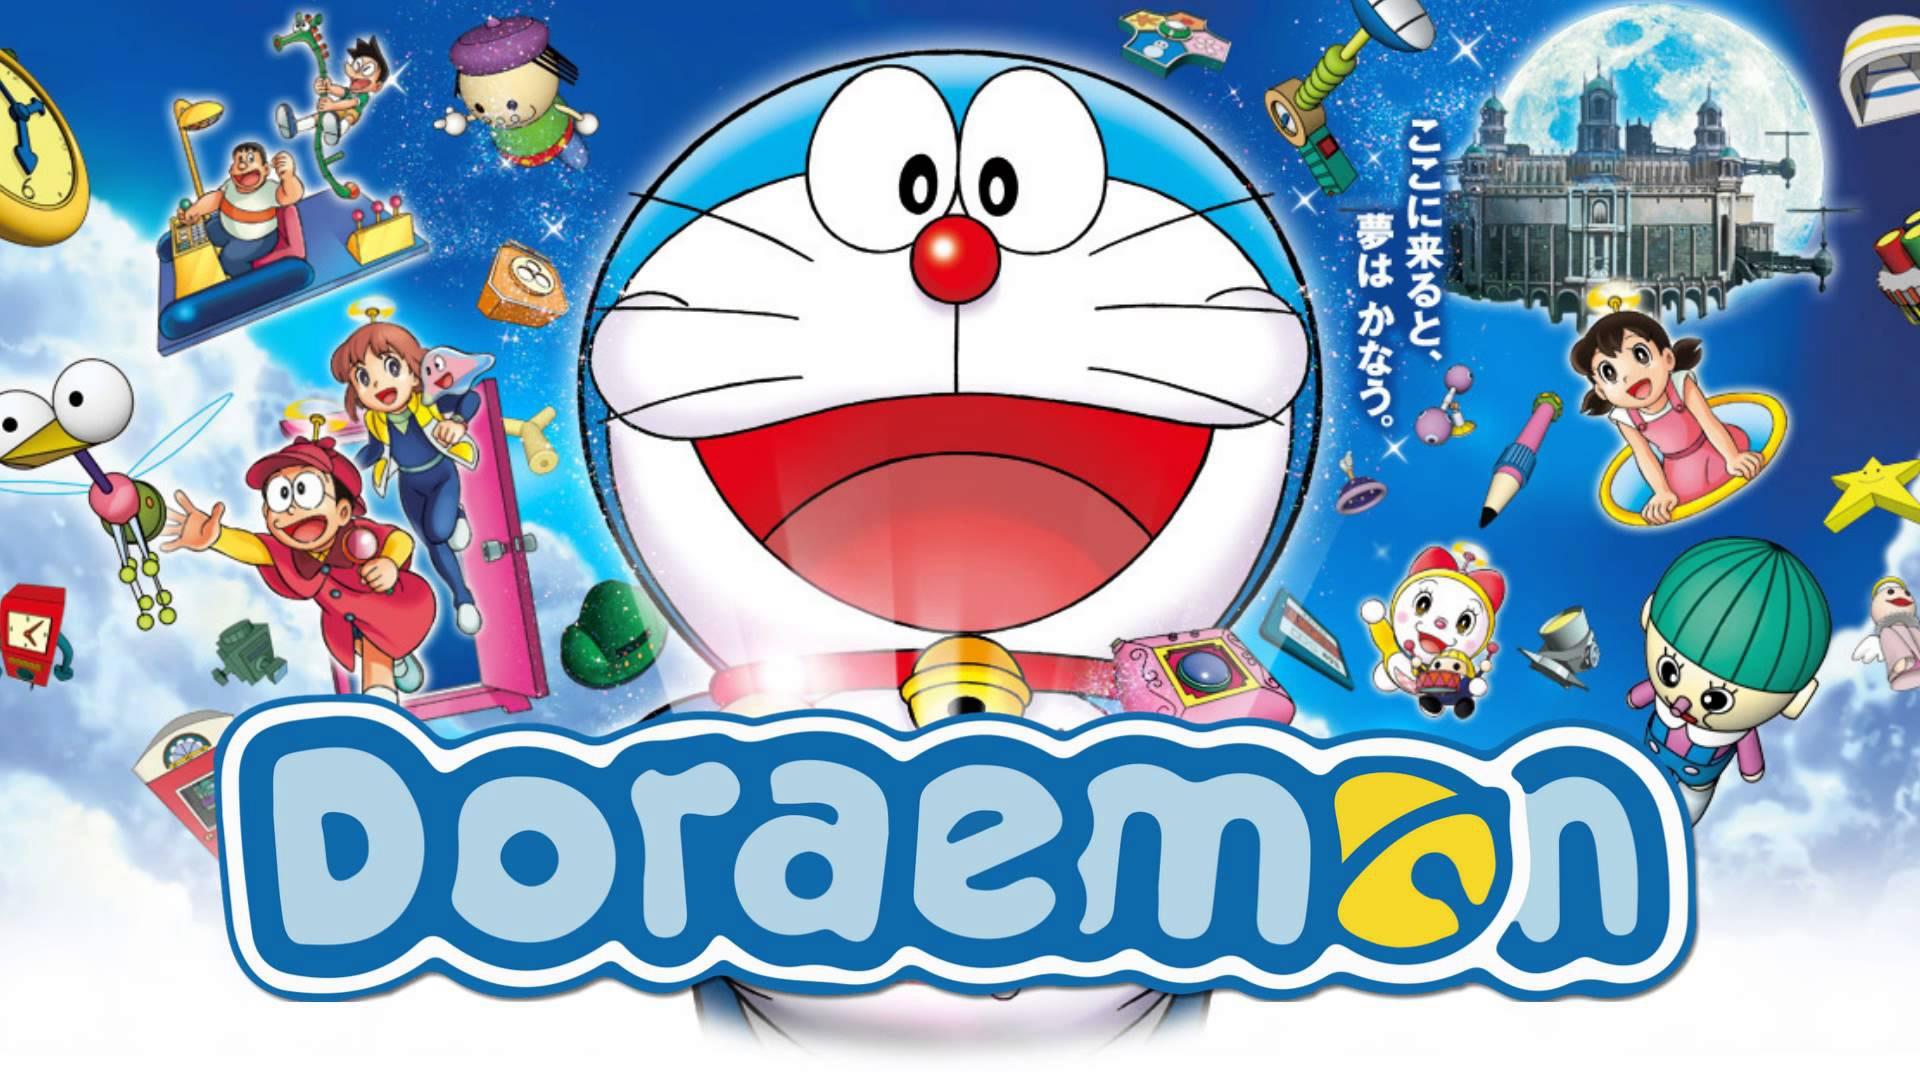 Doraemon Wallpaper Computer HD Desktop 1920x1080